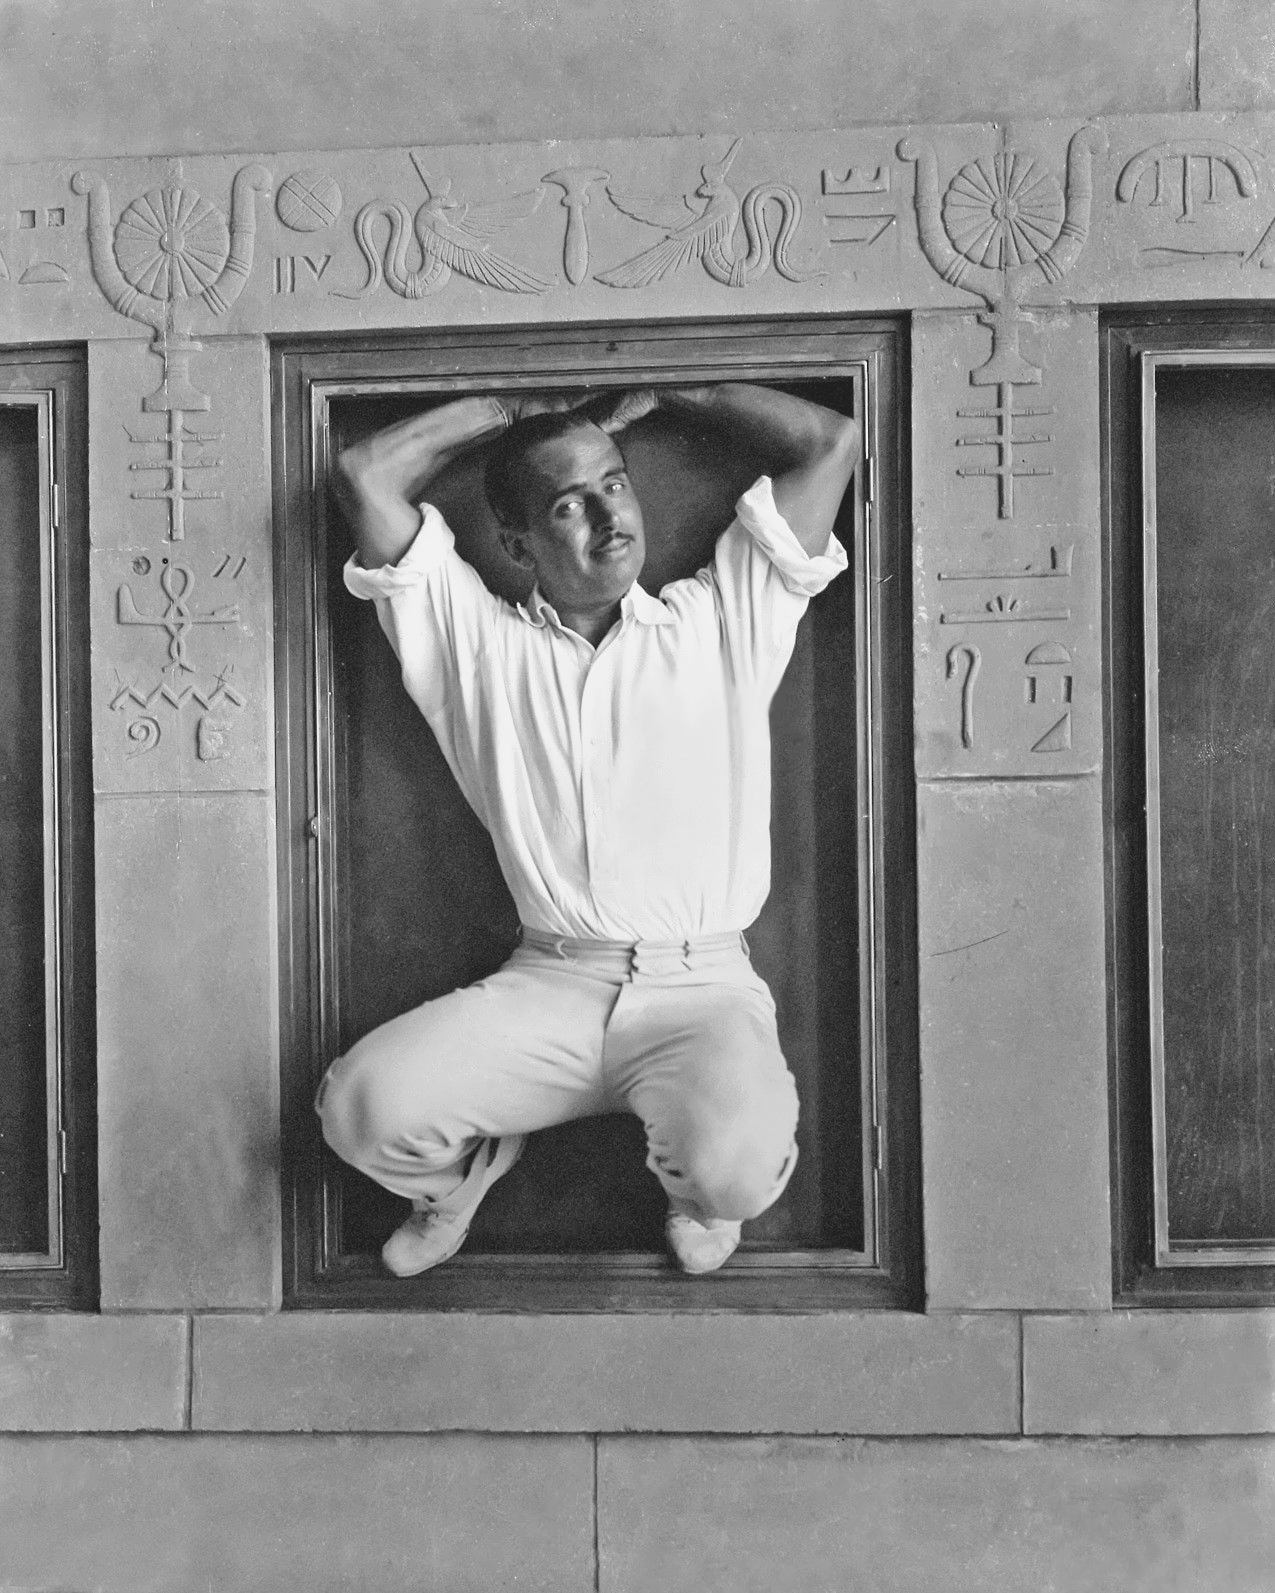 Douglas Fairbanks at Grauman's Egyptian Theater during construction, 1921